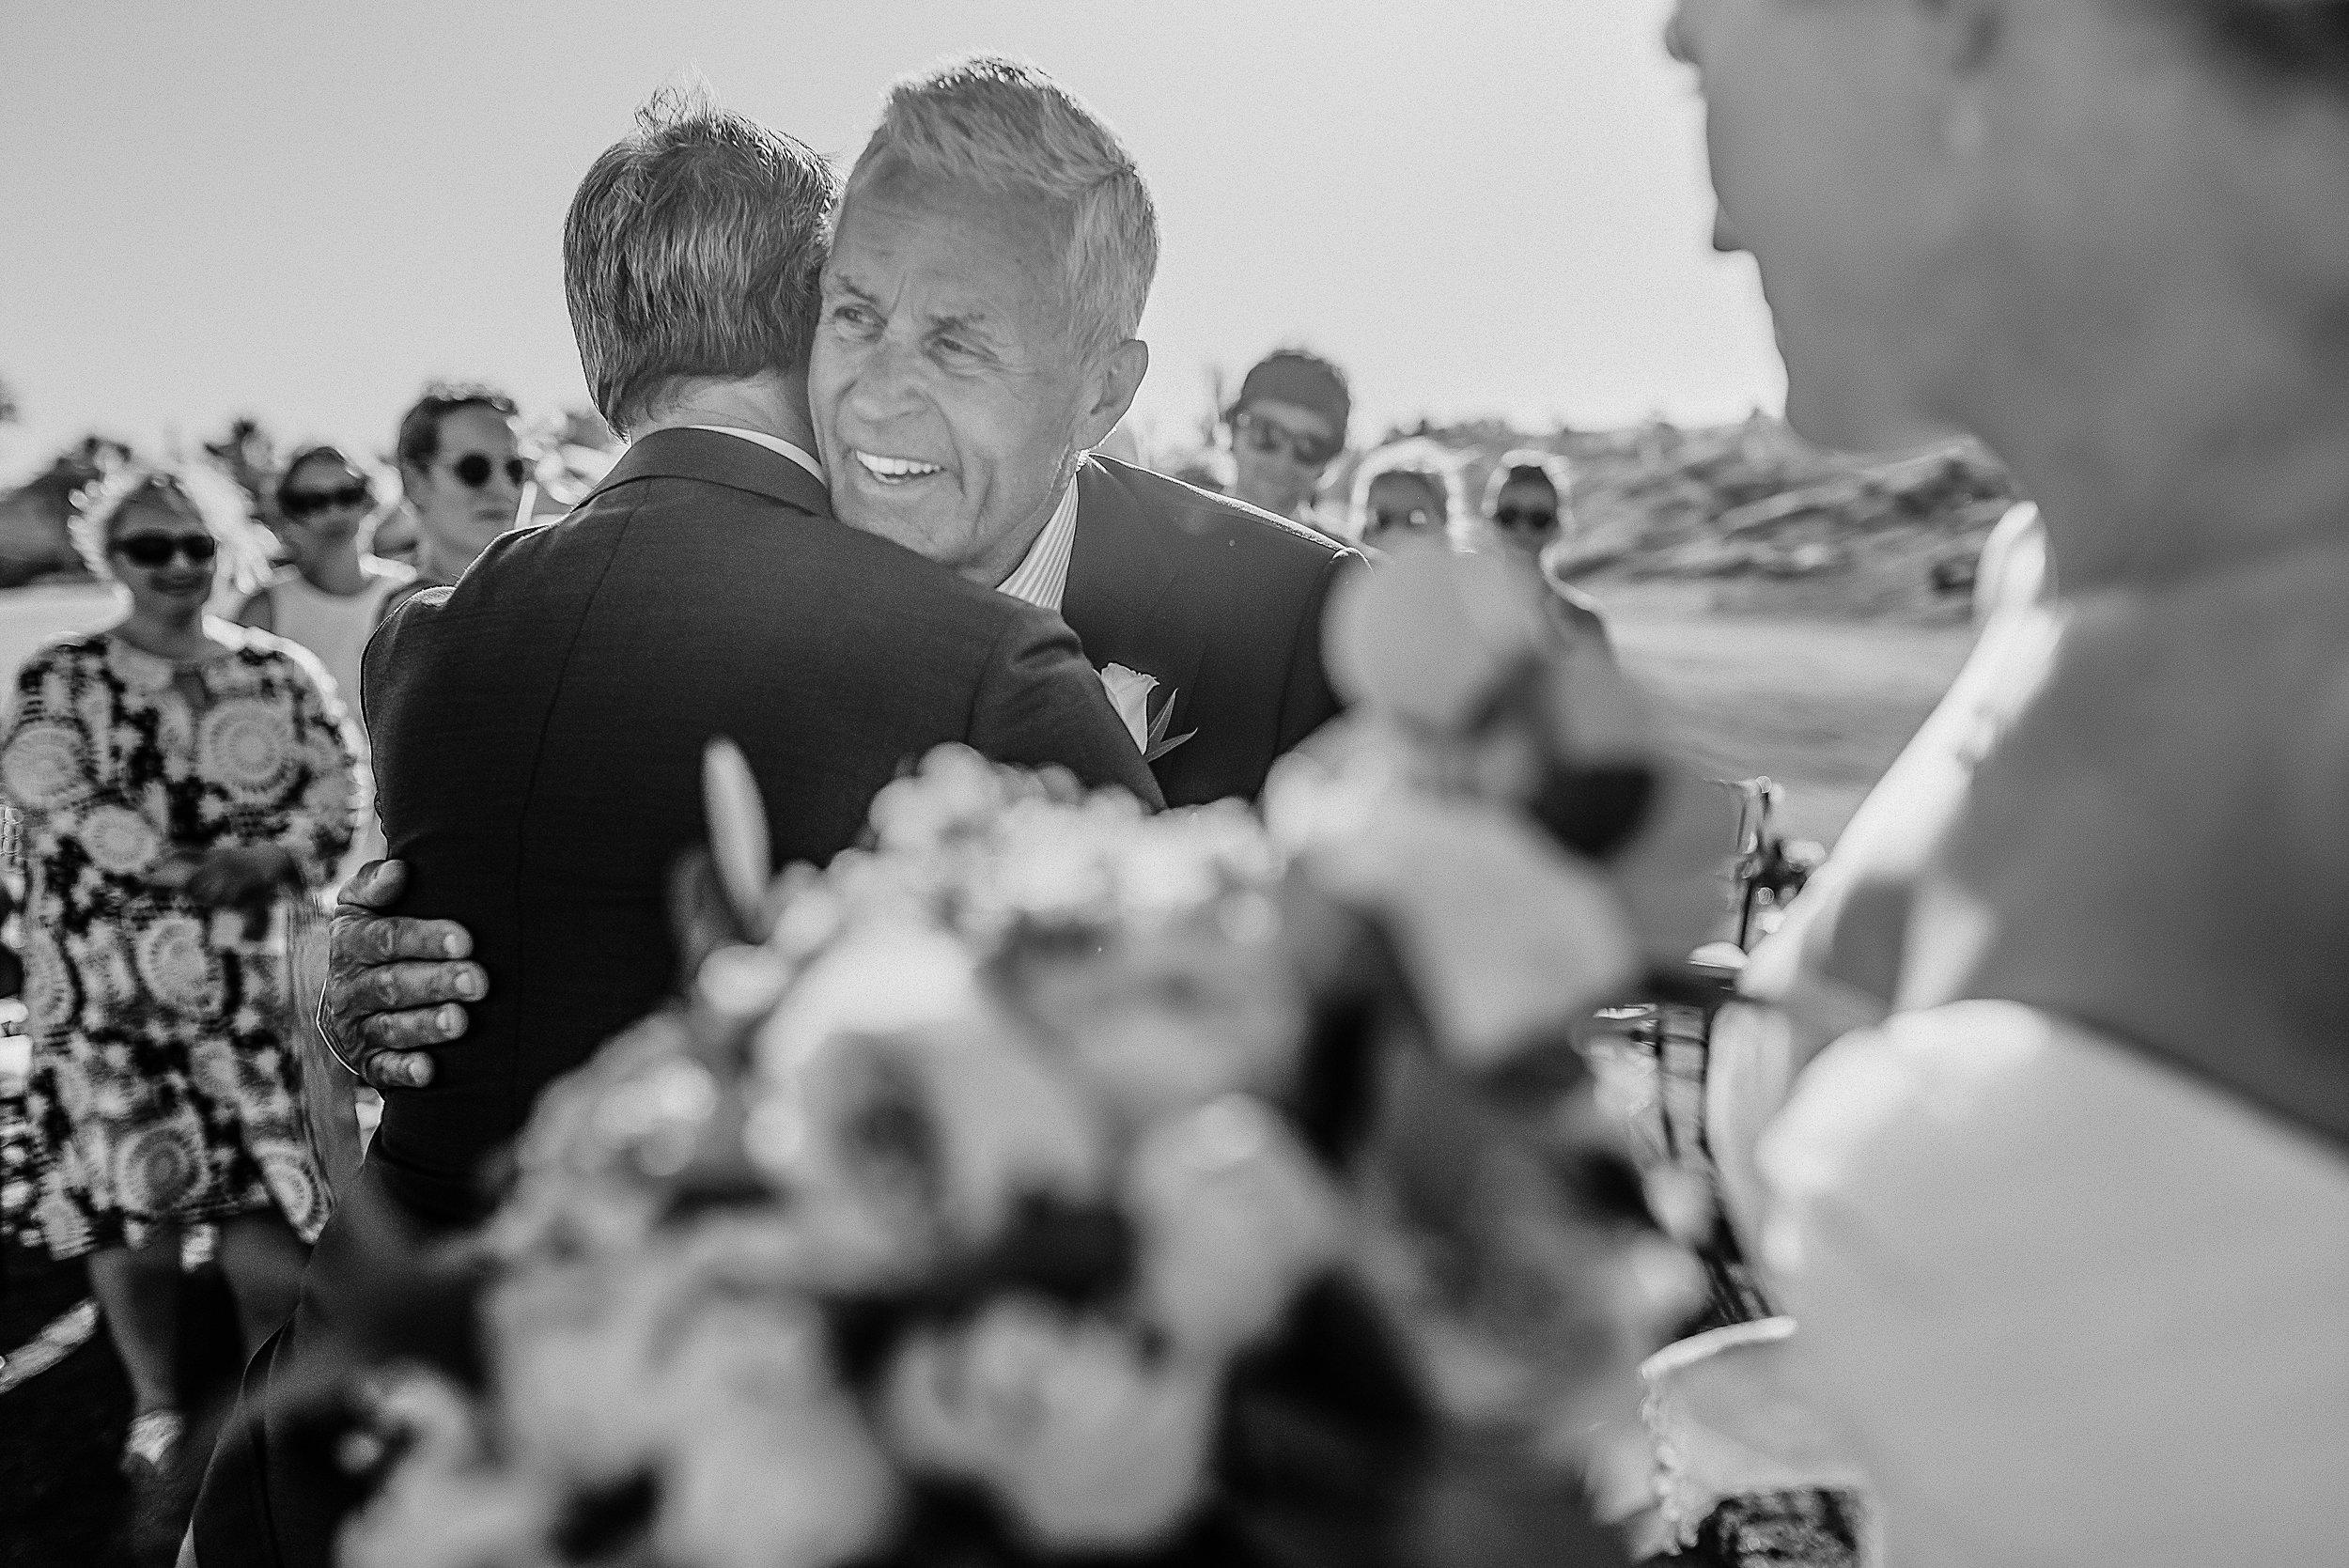 Cabo-destination-weddings-19.JPG